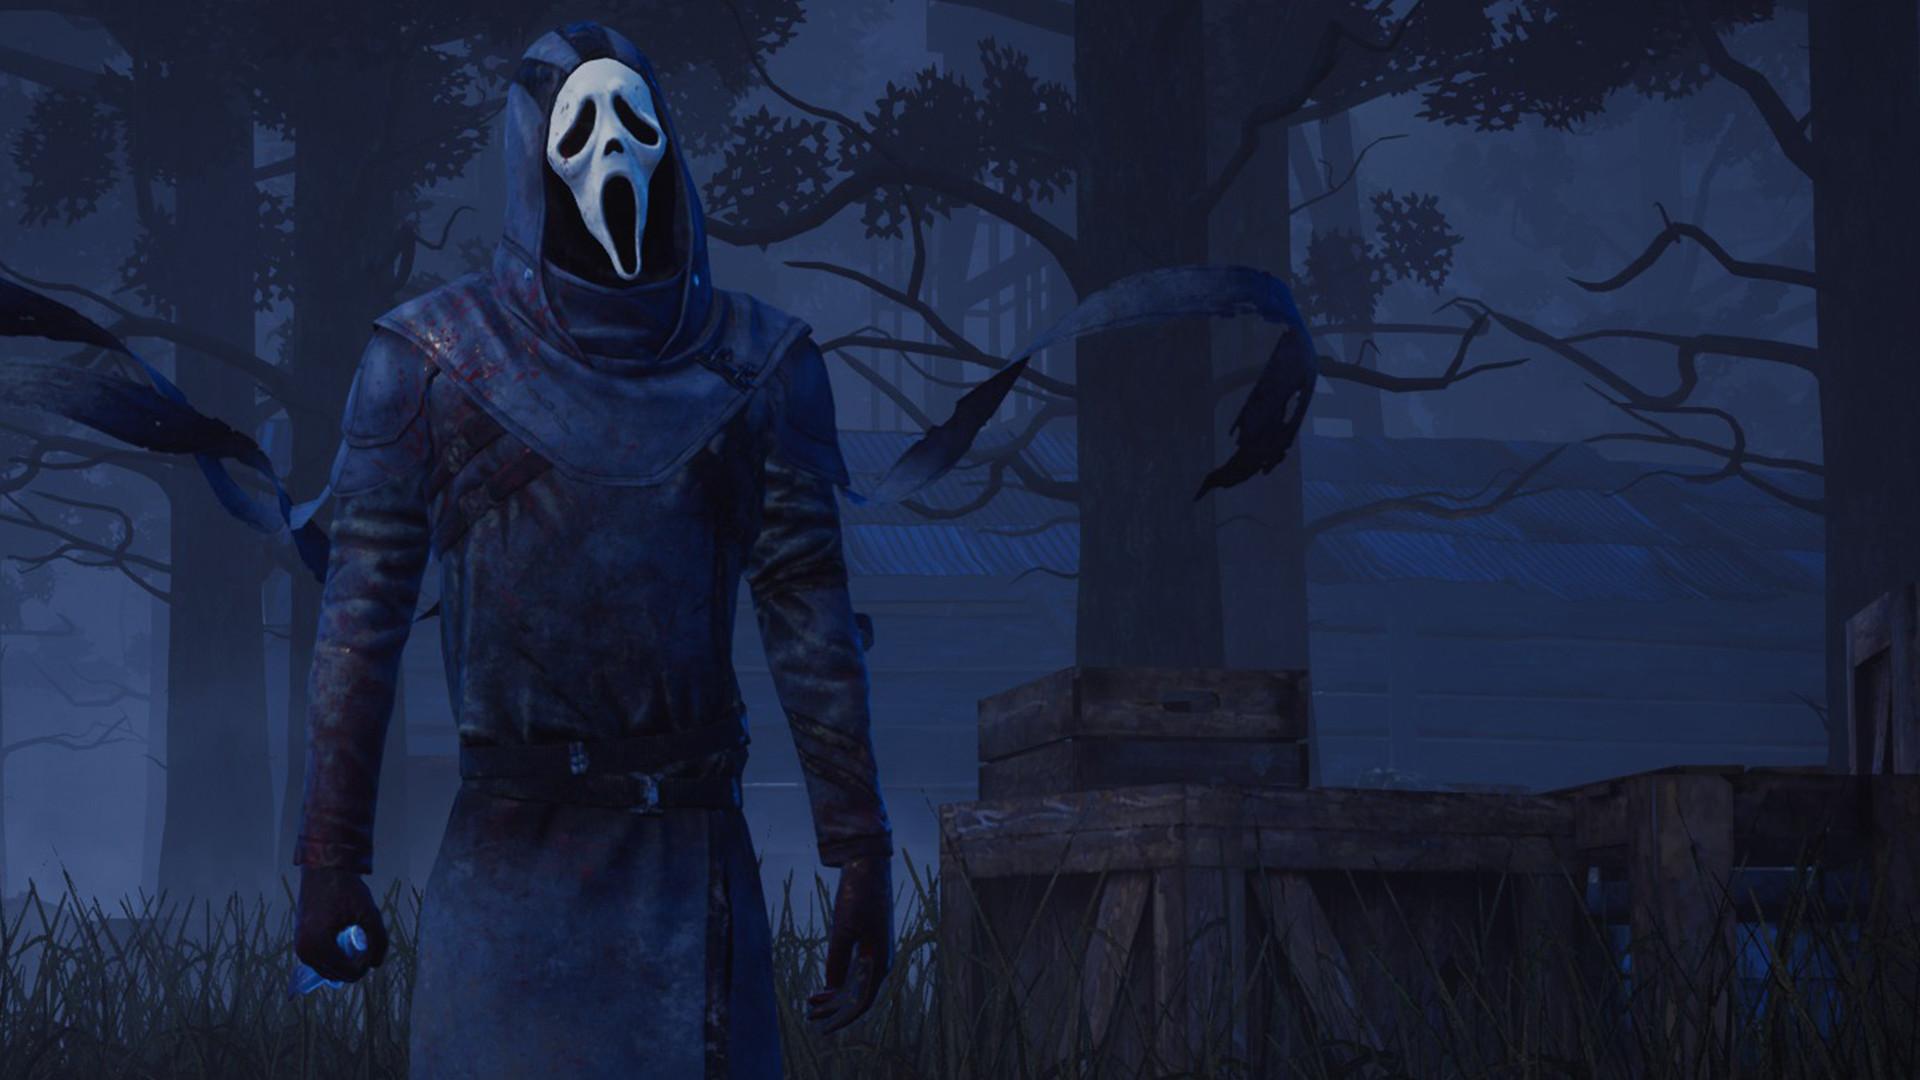 KHAiHOM.com - Dead by Daylight: Ghost Face®